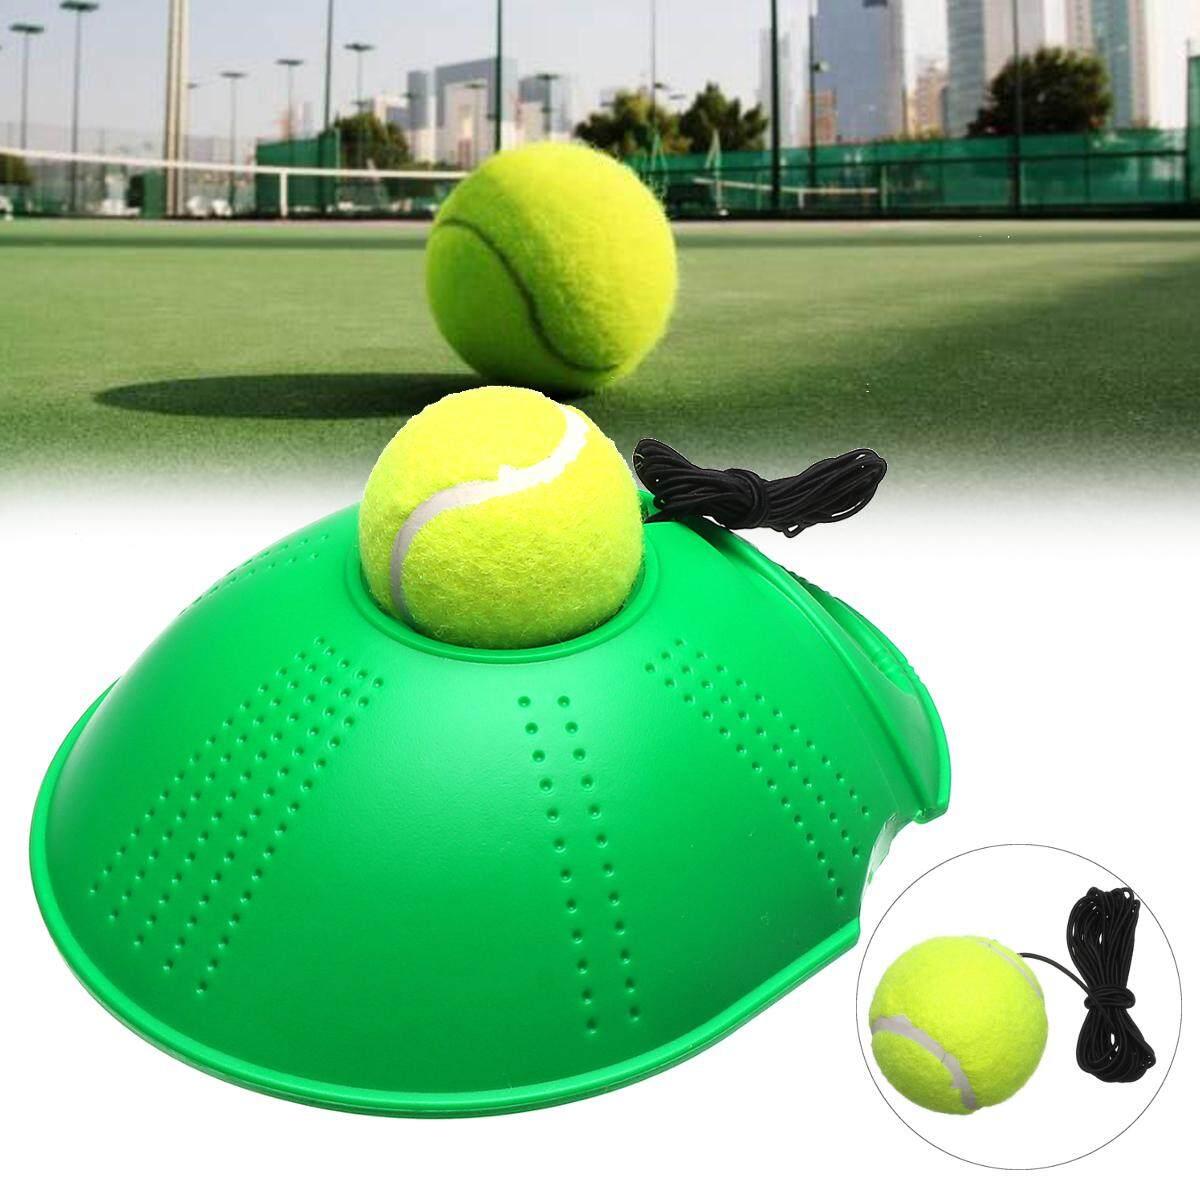 Tunggal Tenis Alat Latihan Pantul Belajar Mandiri Pelatihan Bola Baseboard Pemegang Bantuan-Internasional By Audew.